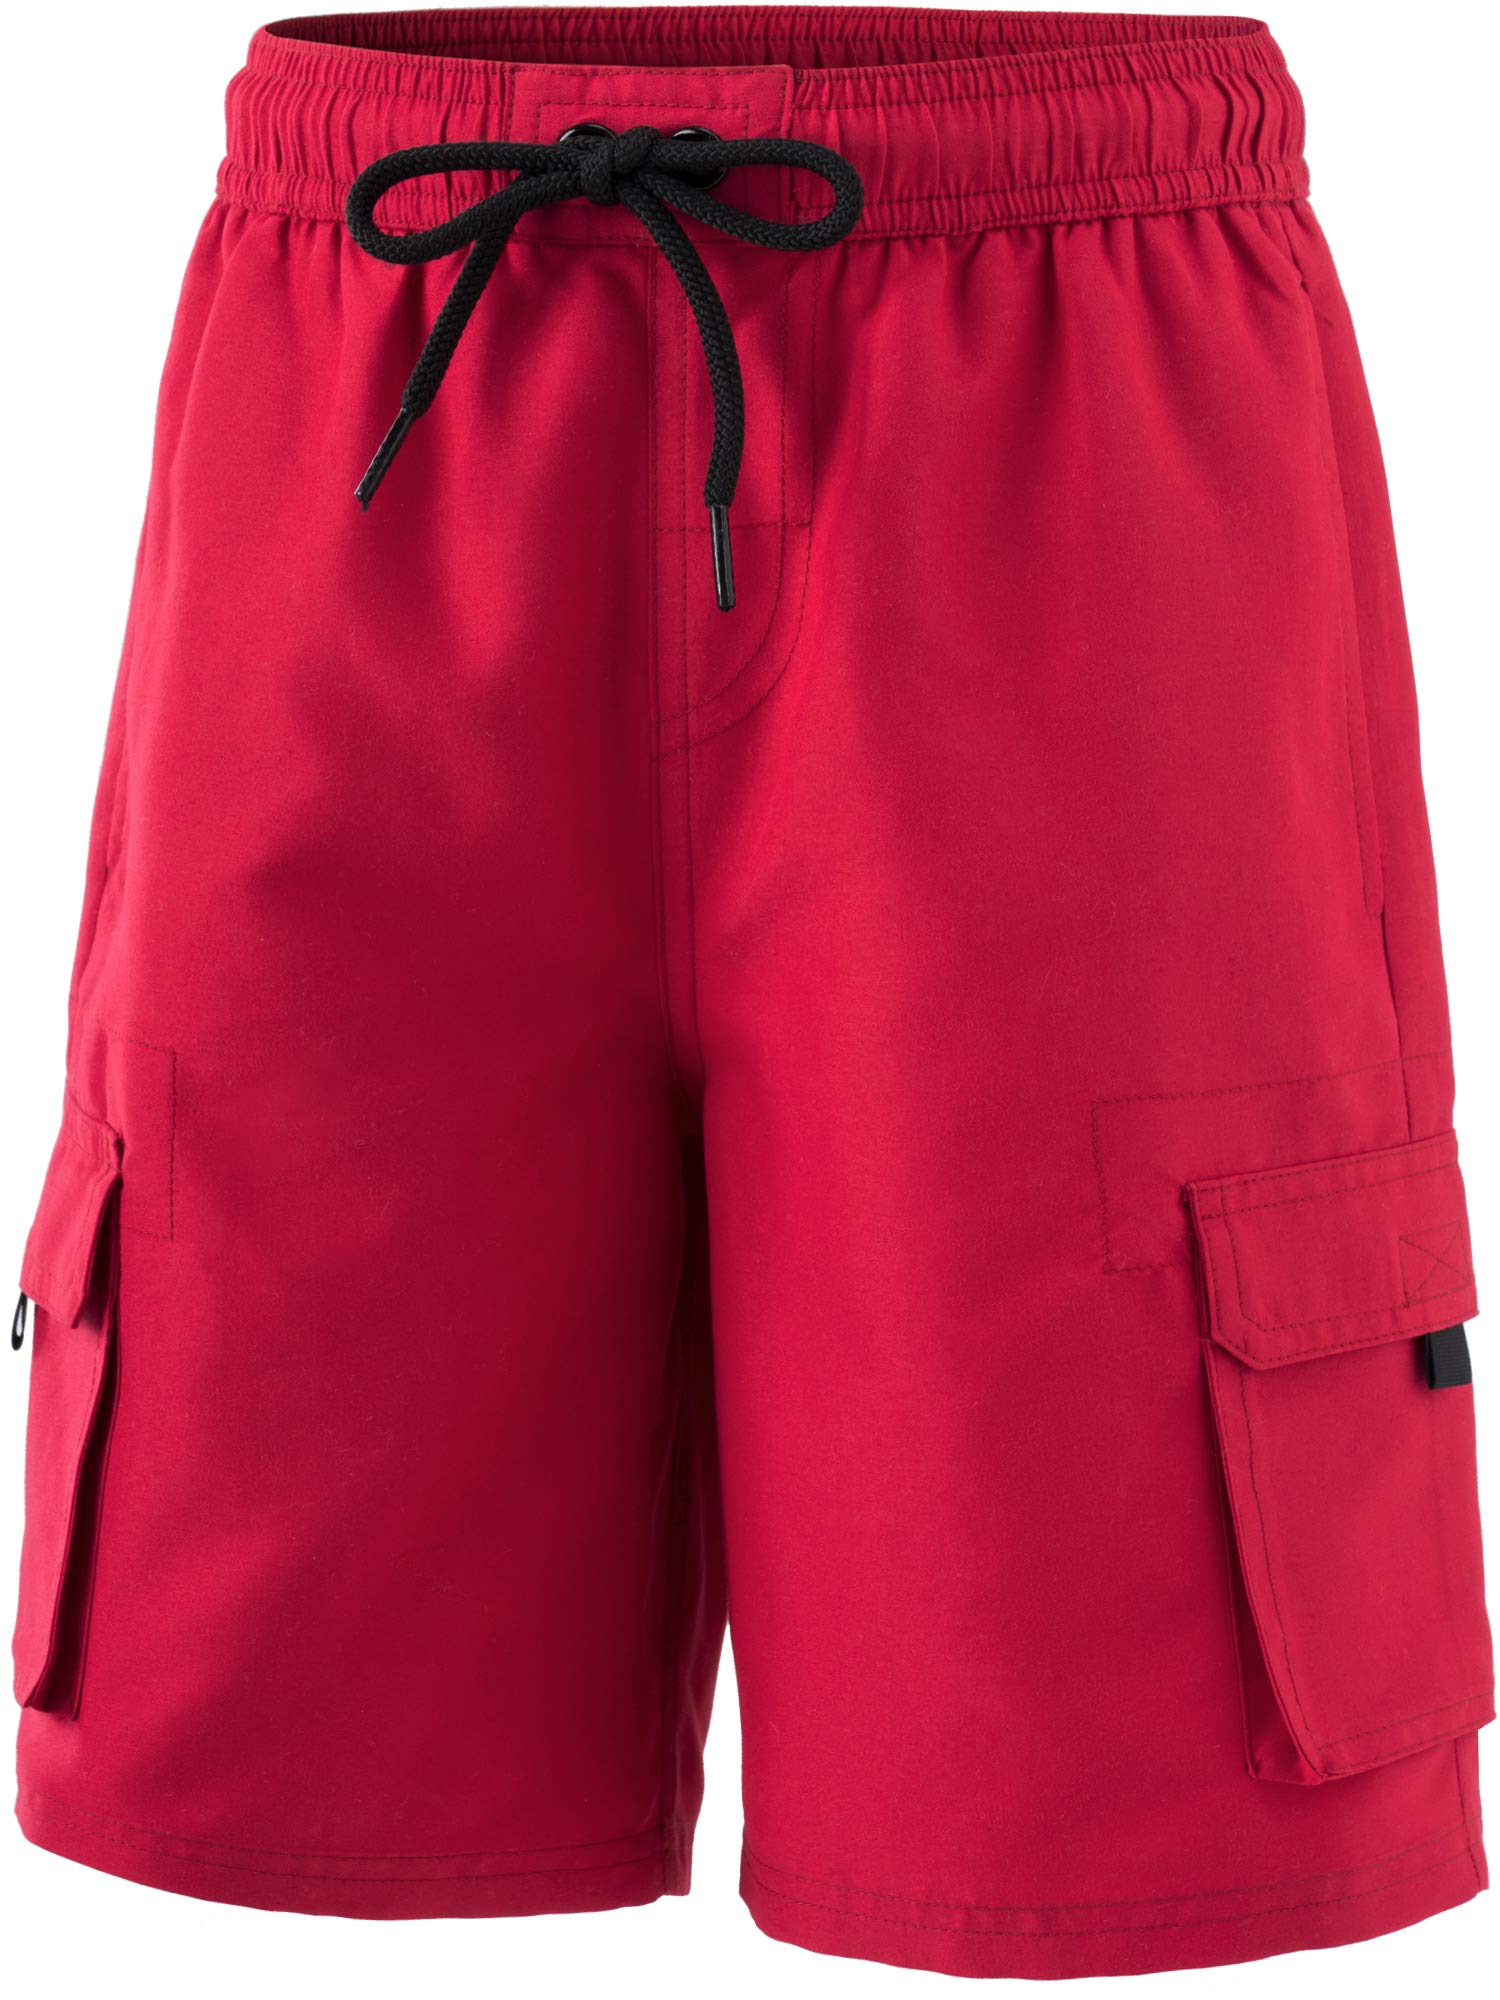 TSLA Boy's Swimtrunks Quick Dry Board Shorts Water Beach Board Shorts Bottom, Solid(bsb40) - Red, 3X-Small (2) by TSLA